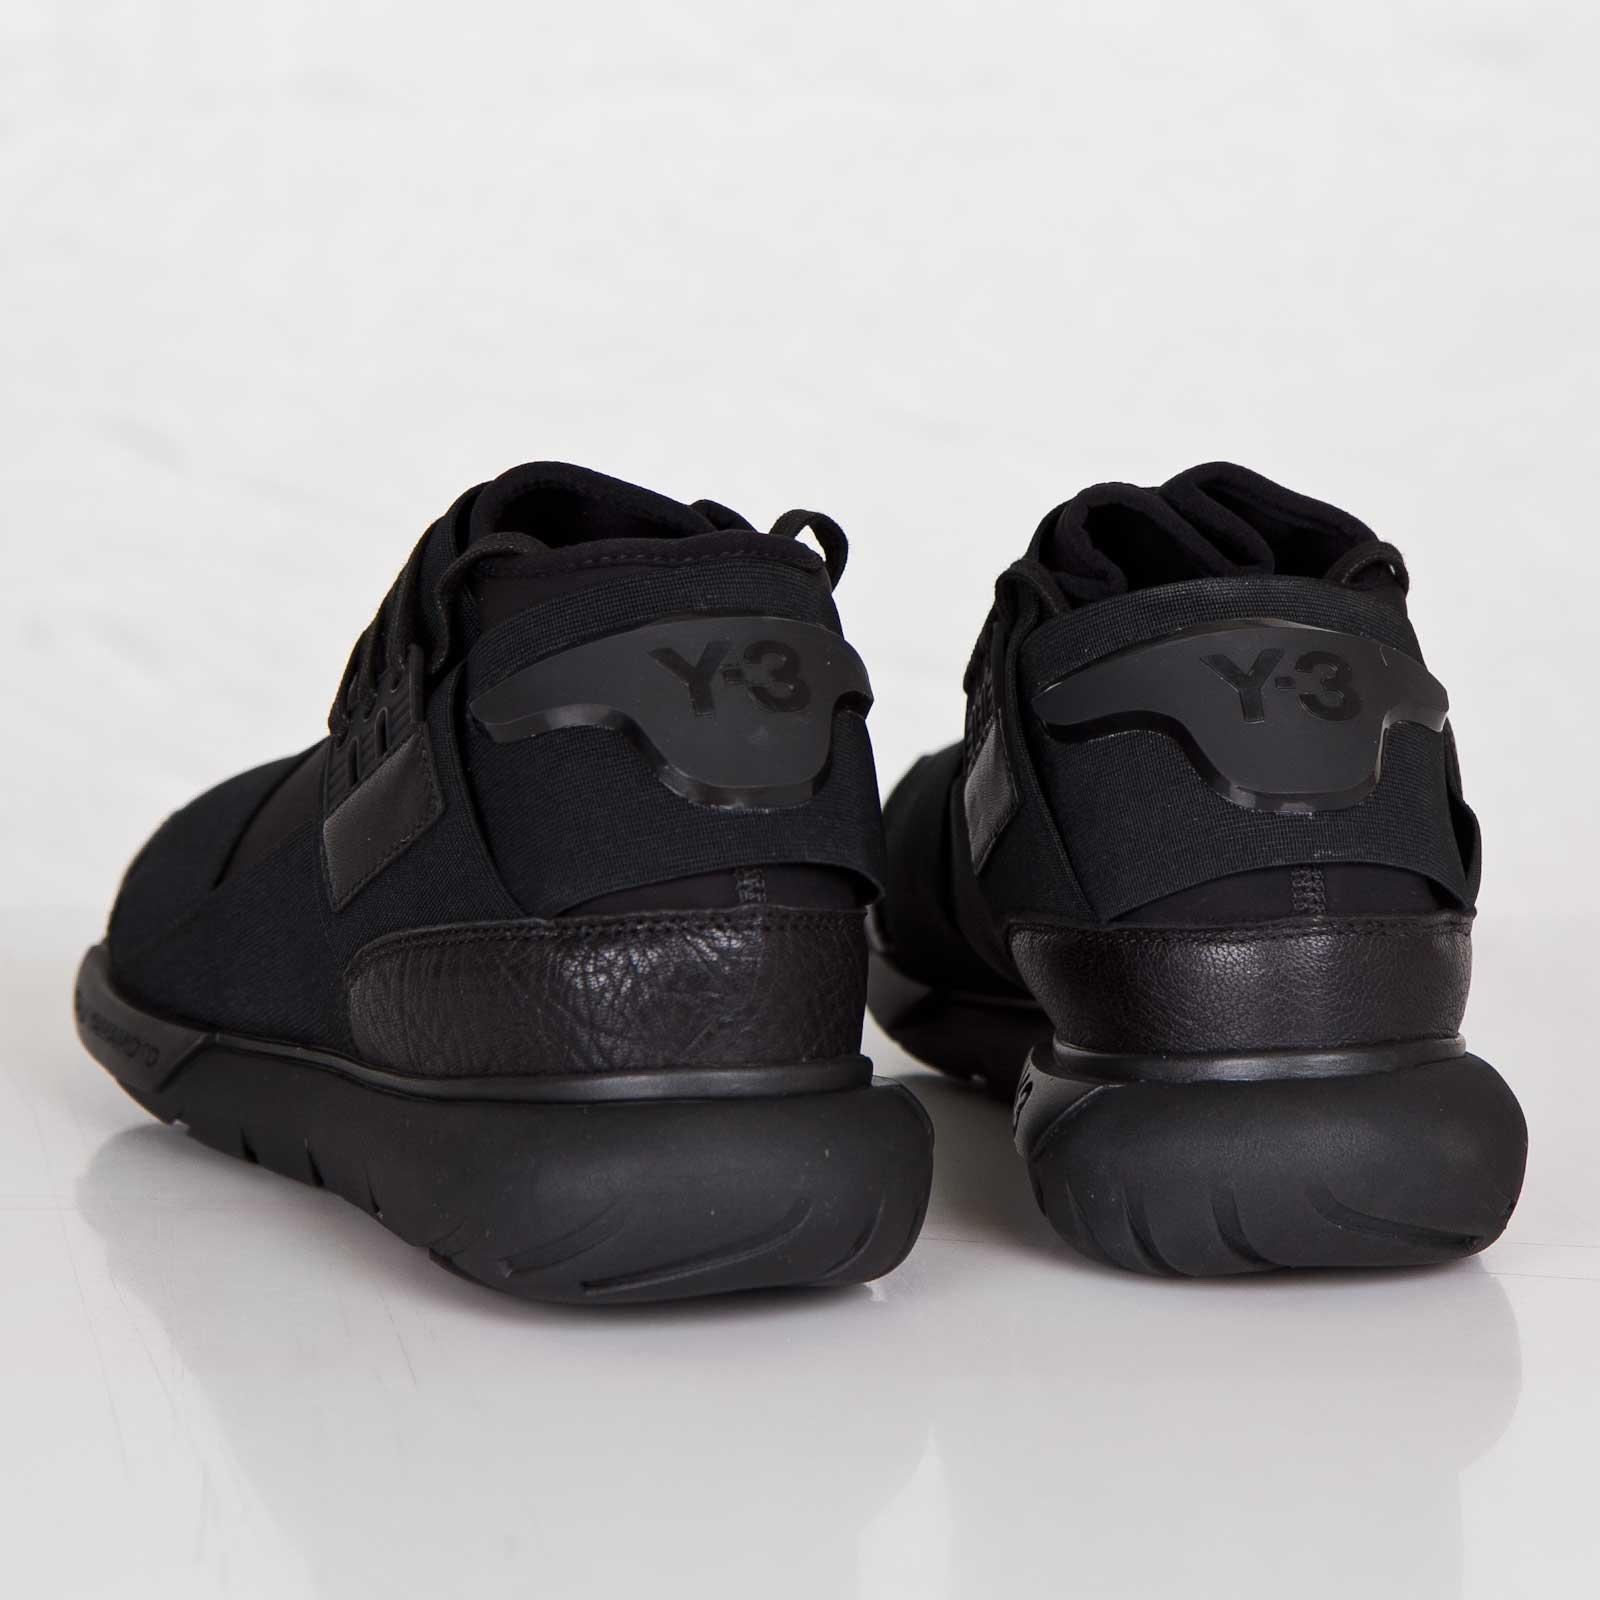 ADIDAS Yohji Yamamoto Qasa High Trainer shoes